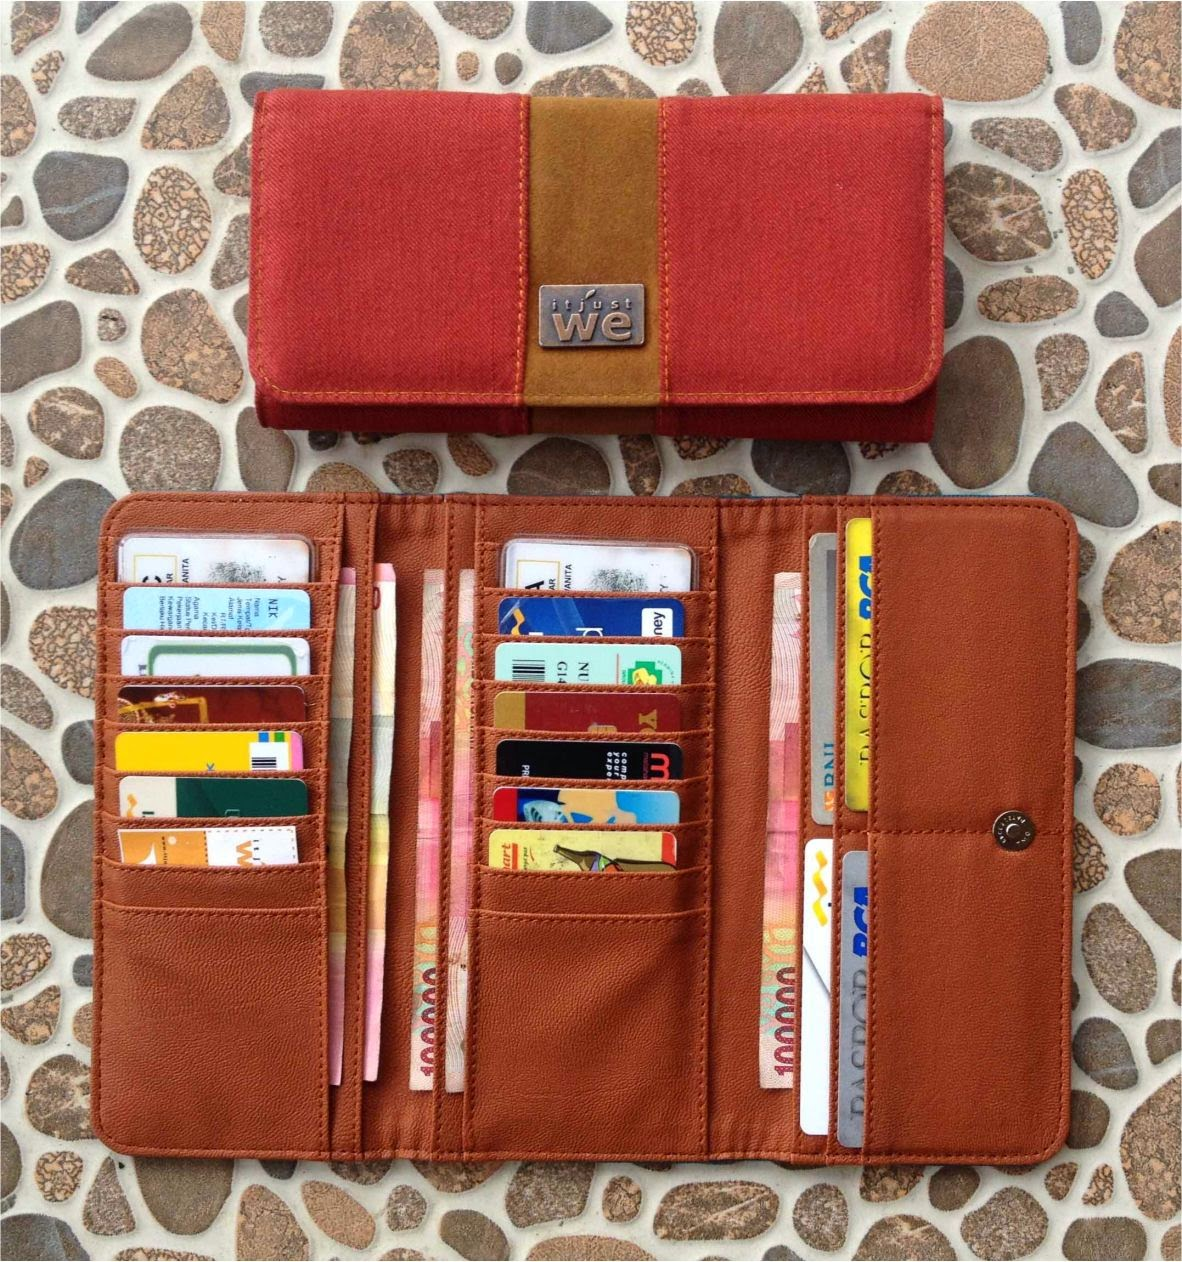 inner dompet kartu dompet jeans terbaru 2015